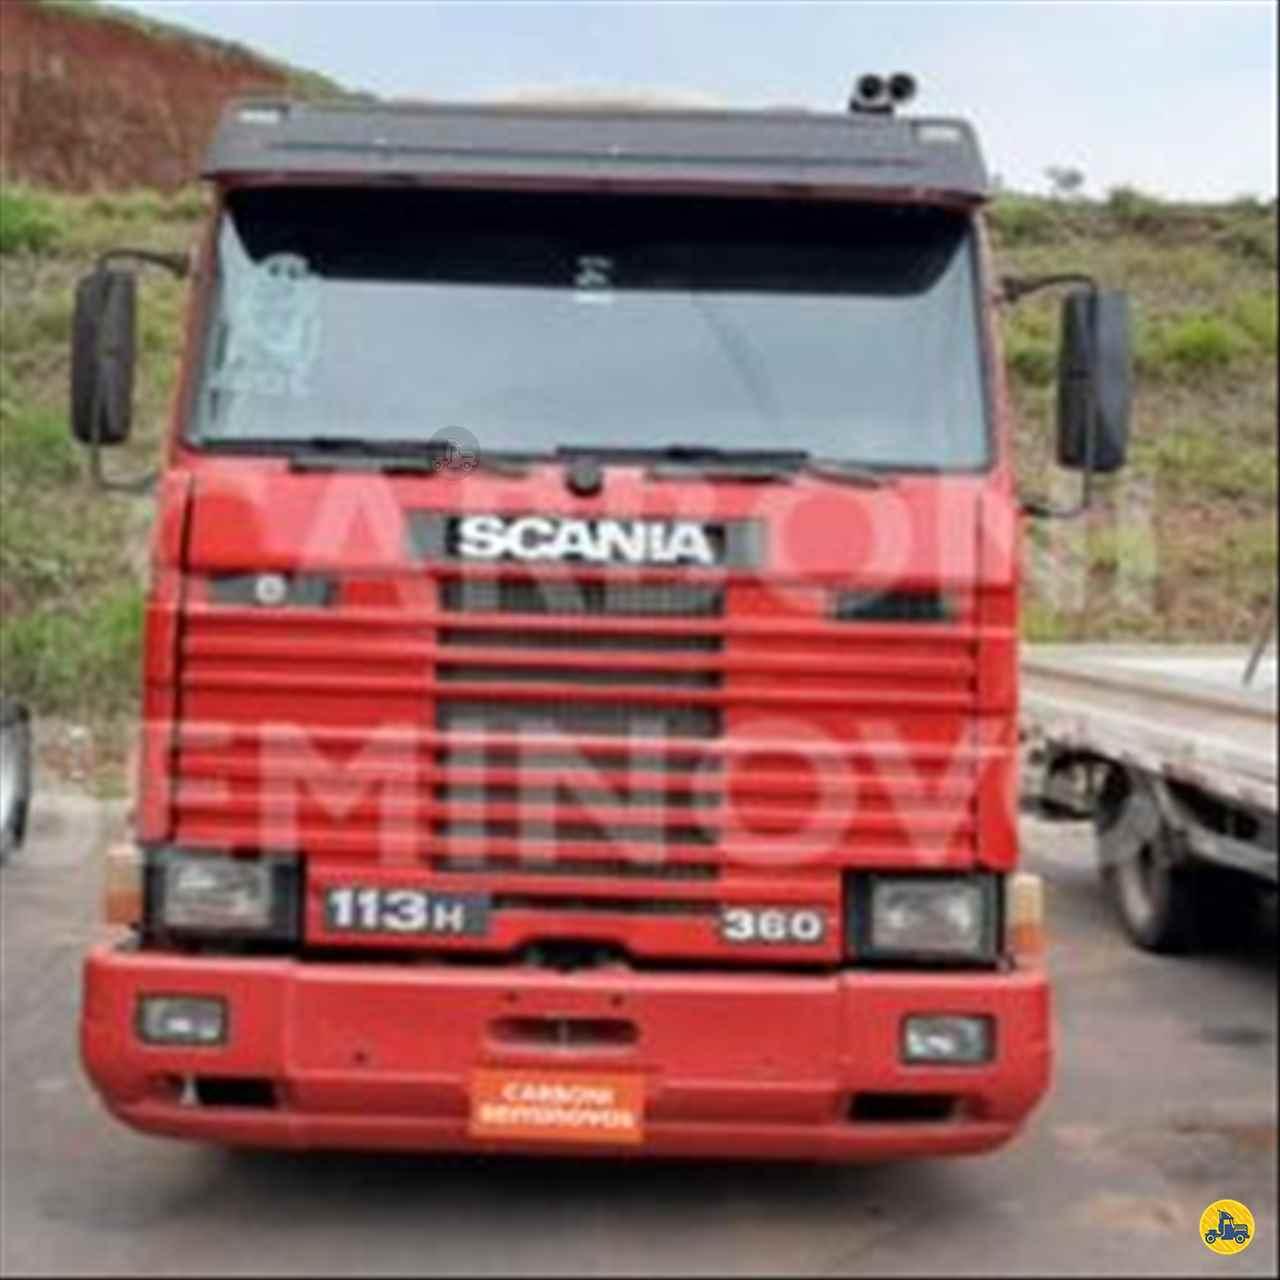 SCANIA SCANIA 113 360  1997/1997 Carboni Iveco